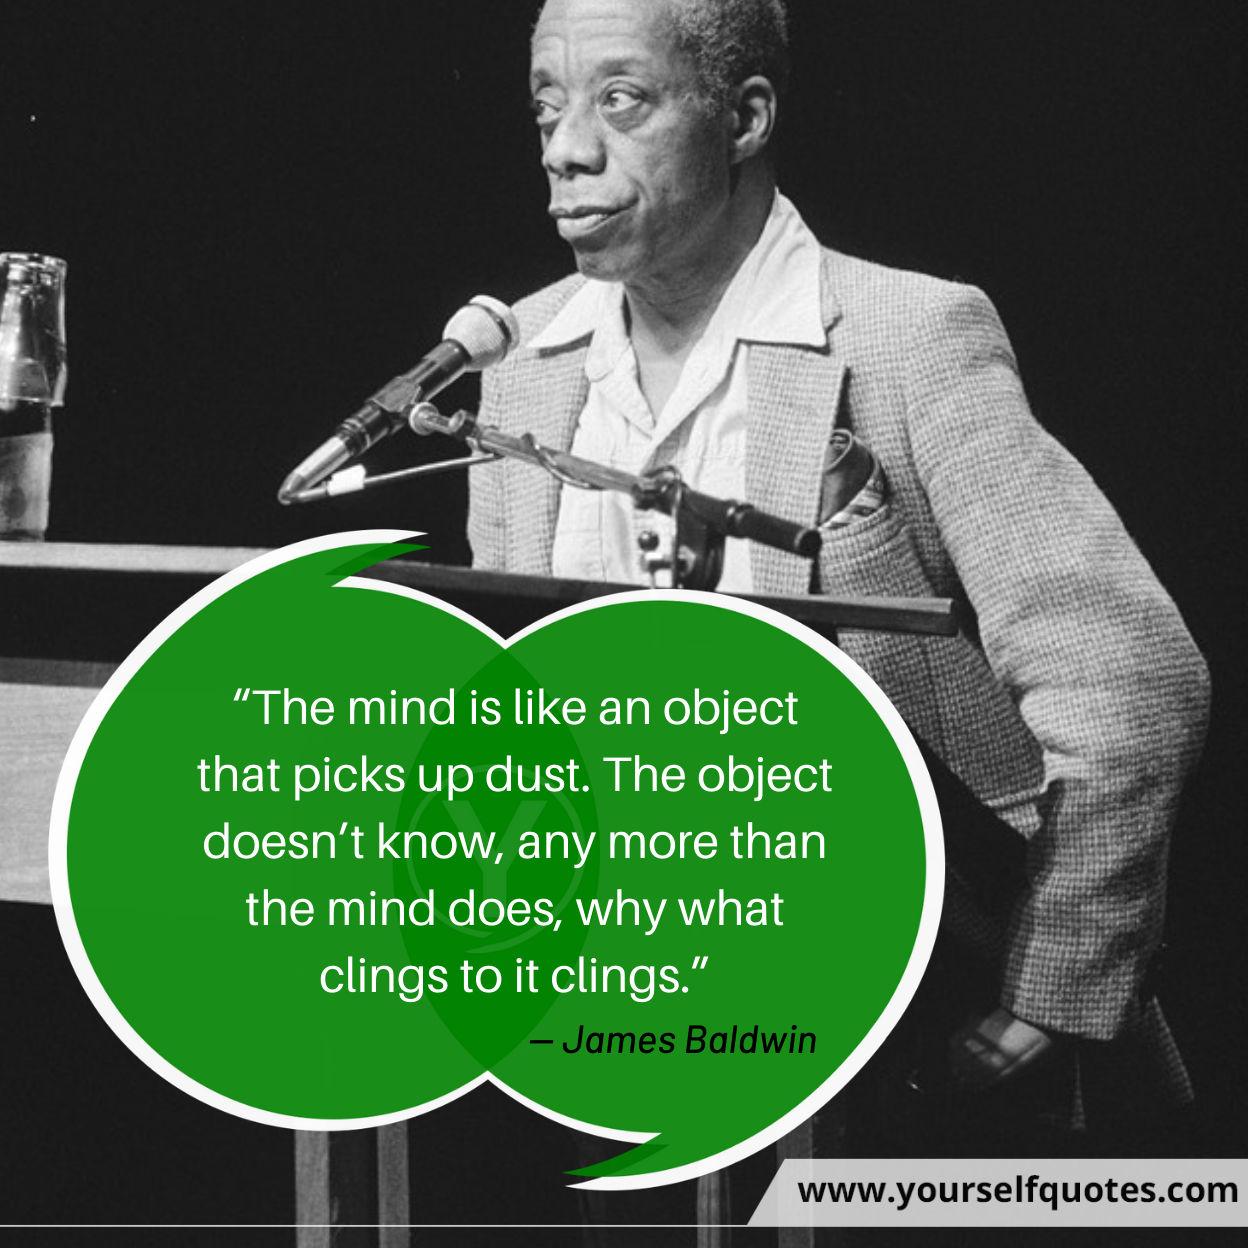 Best James Baldwin Quotes images